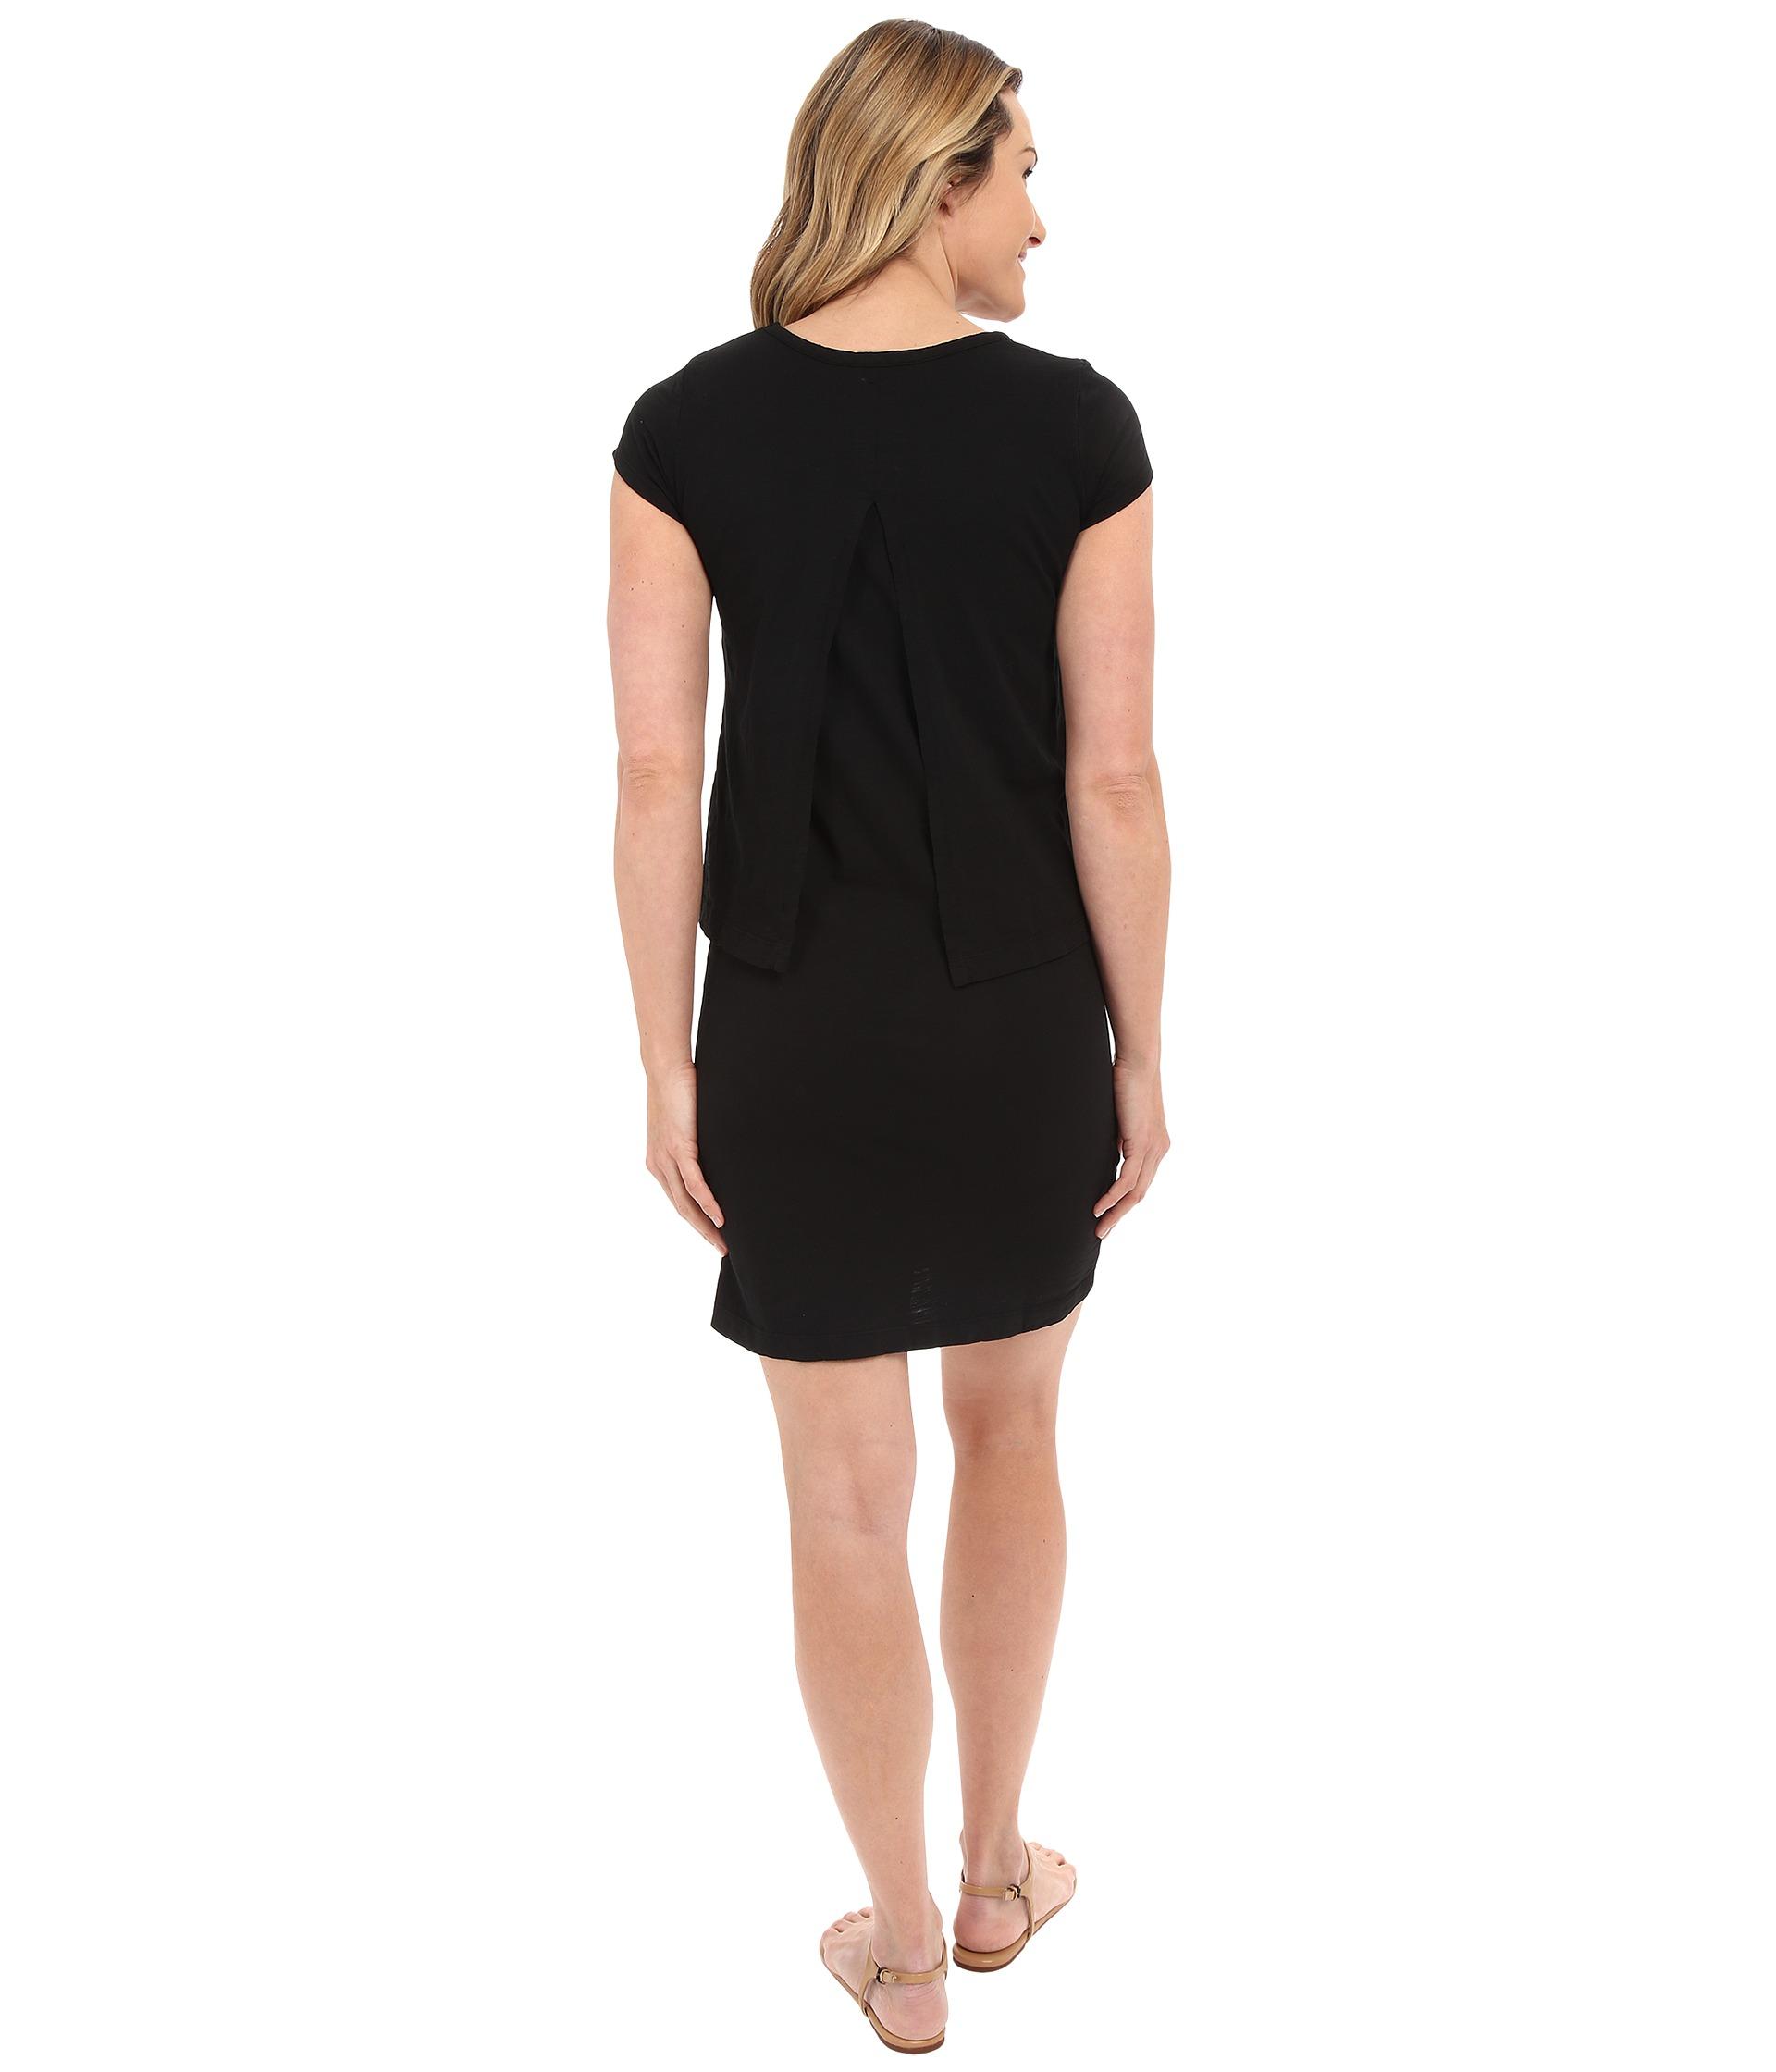 Mod-o-doc Short Sleeves Slub Jersey Double Layer T-Shirt Dress